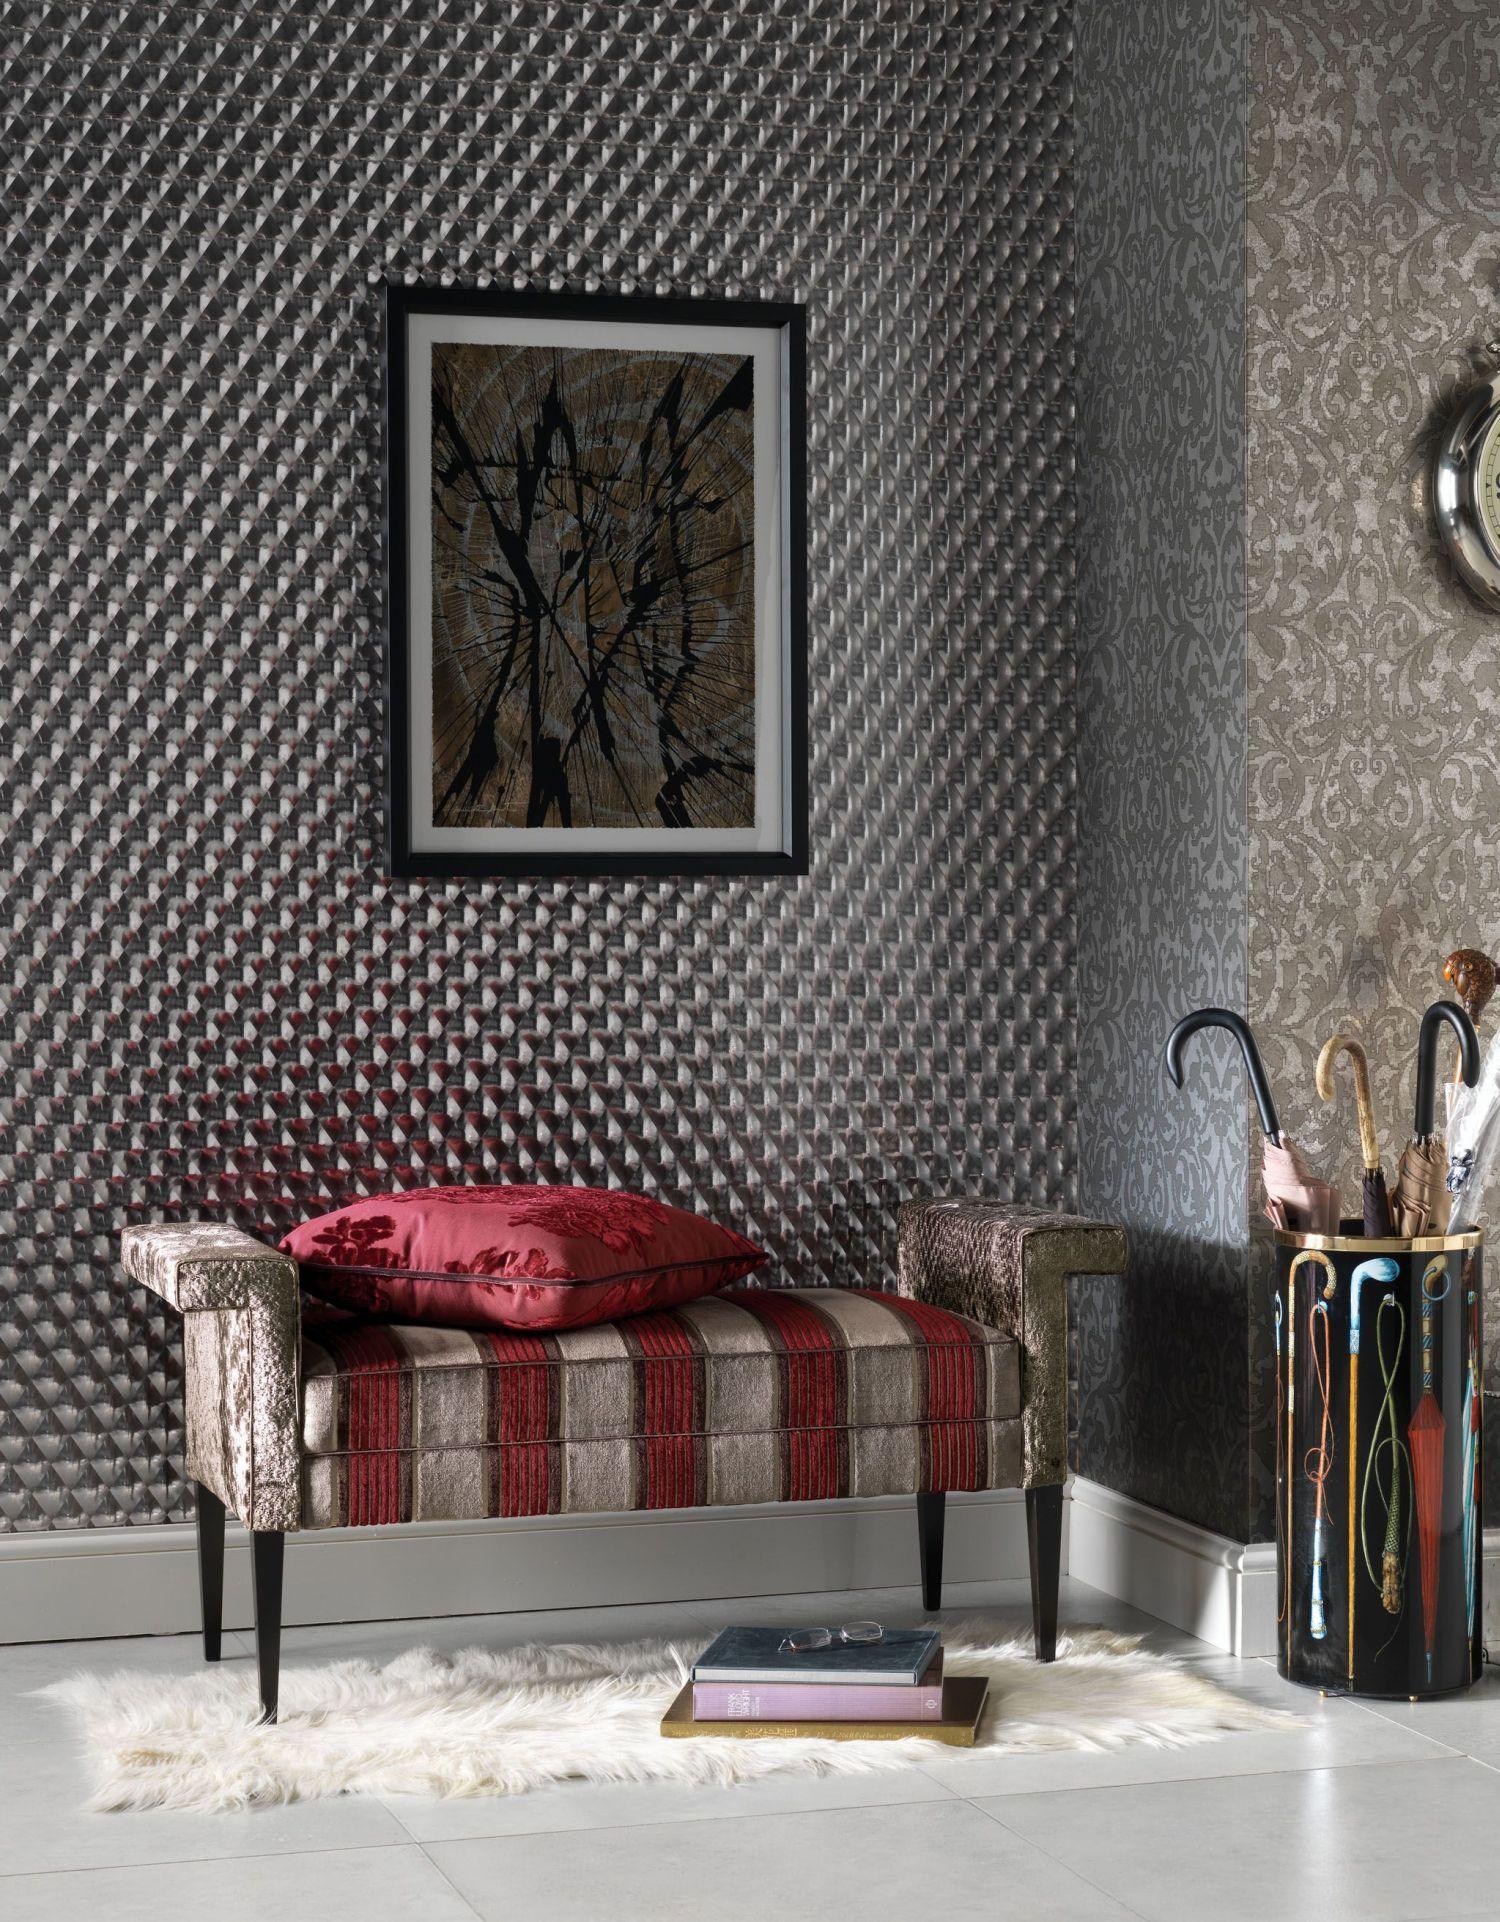 rombico wallpaperosborne & little | wall decor | pinterest